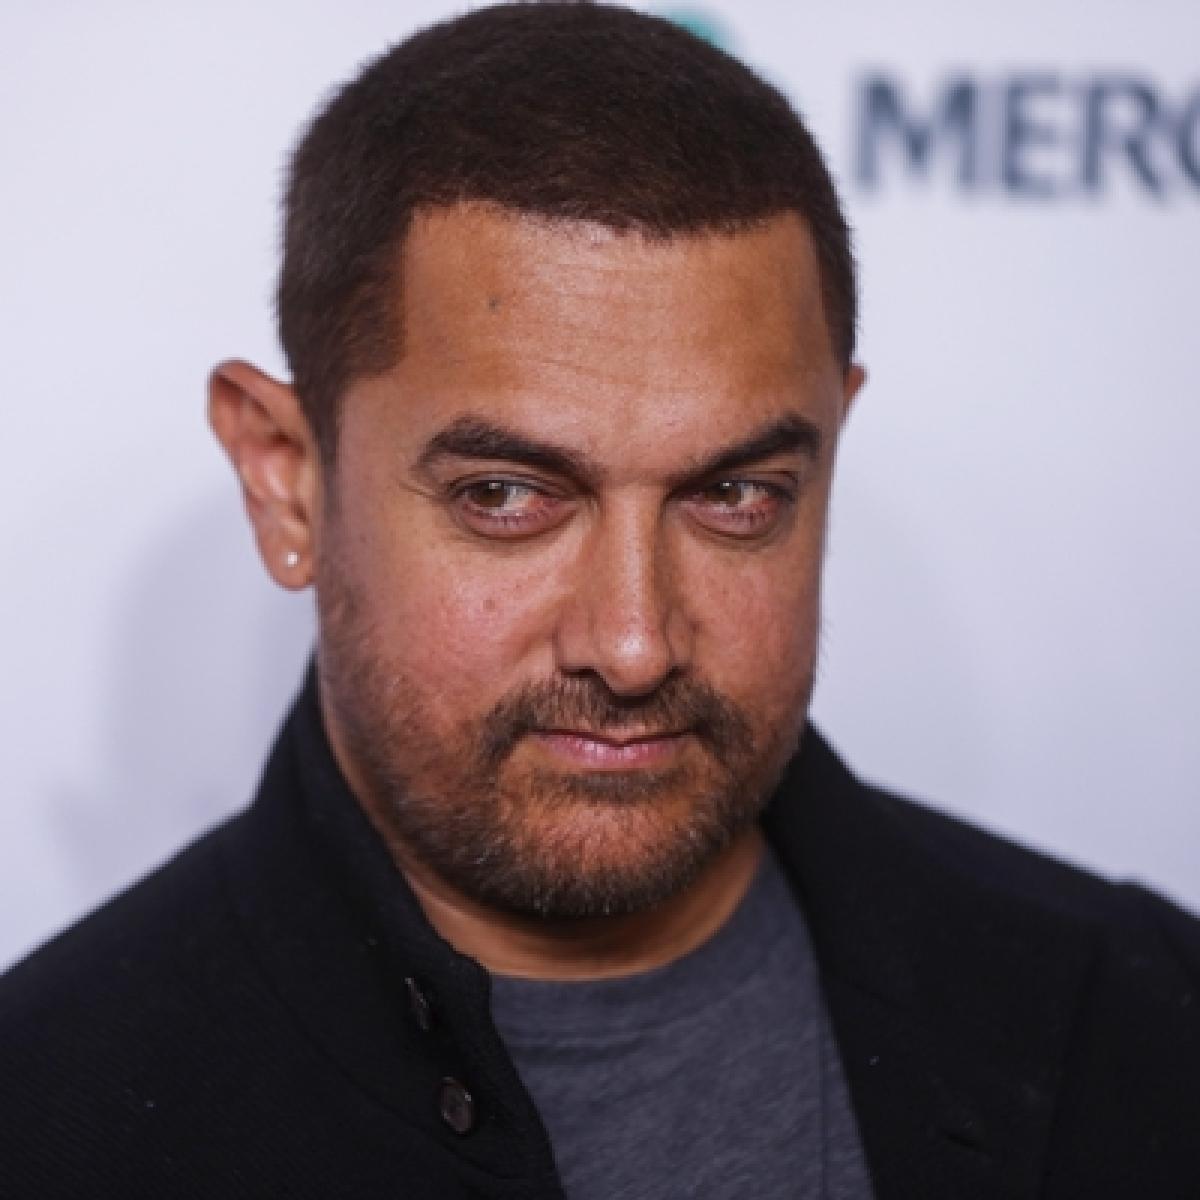 Aamir Khan's blockbuster '3 Idiots' last film played at Japan theatre